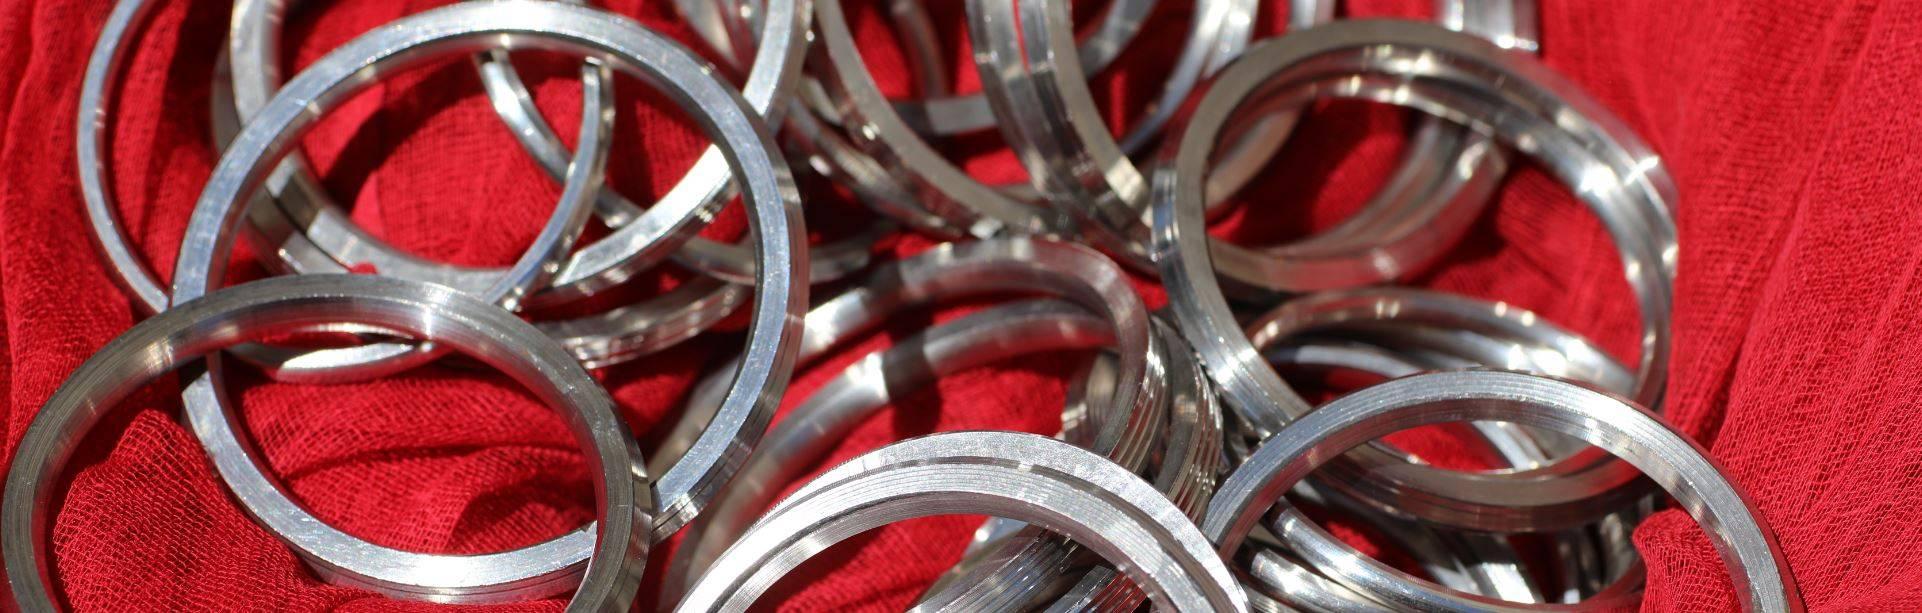 kara bracelet sikh achat mes indes galantes paris